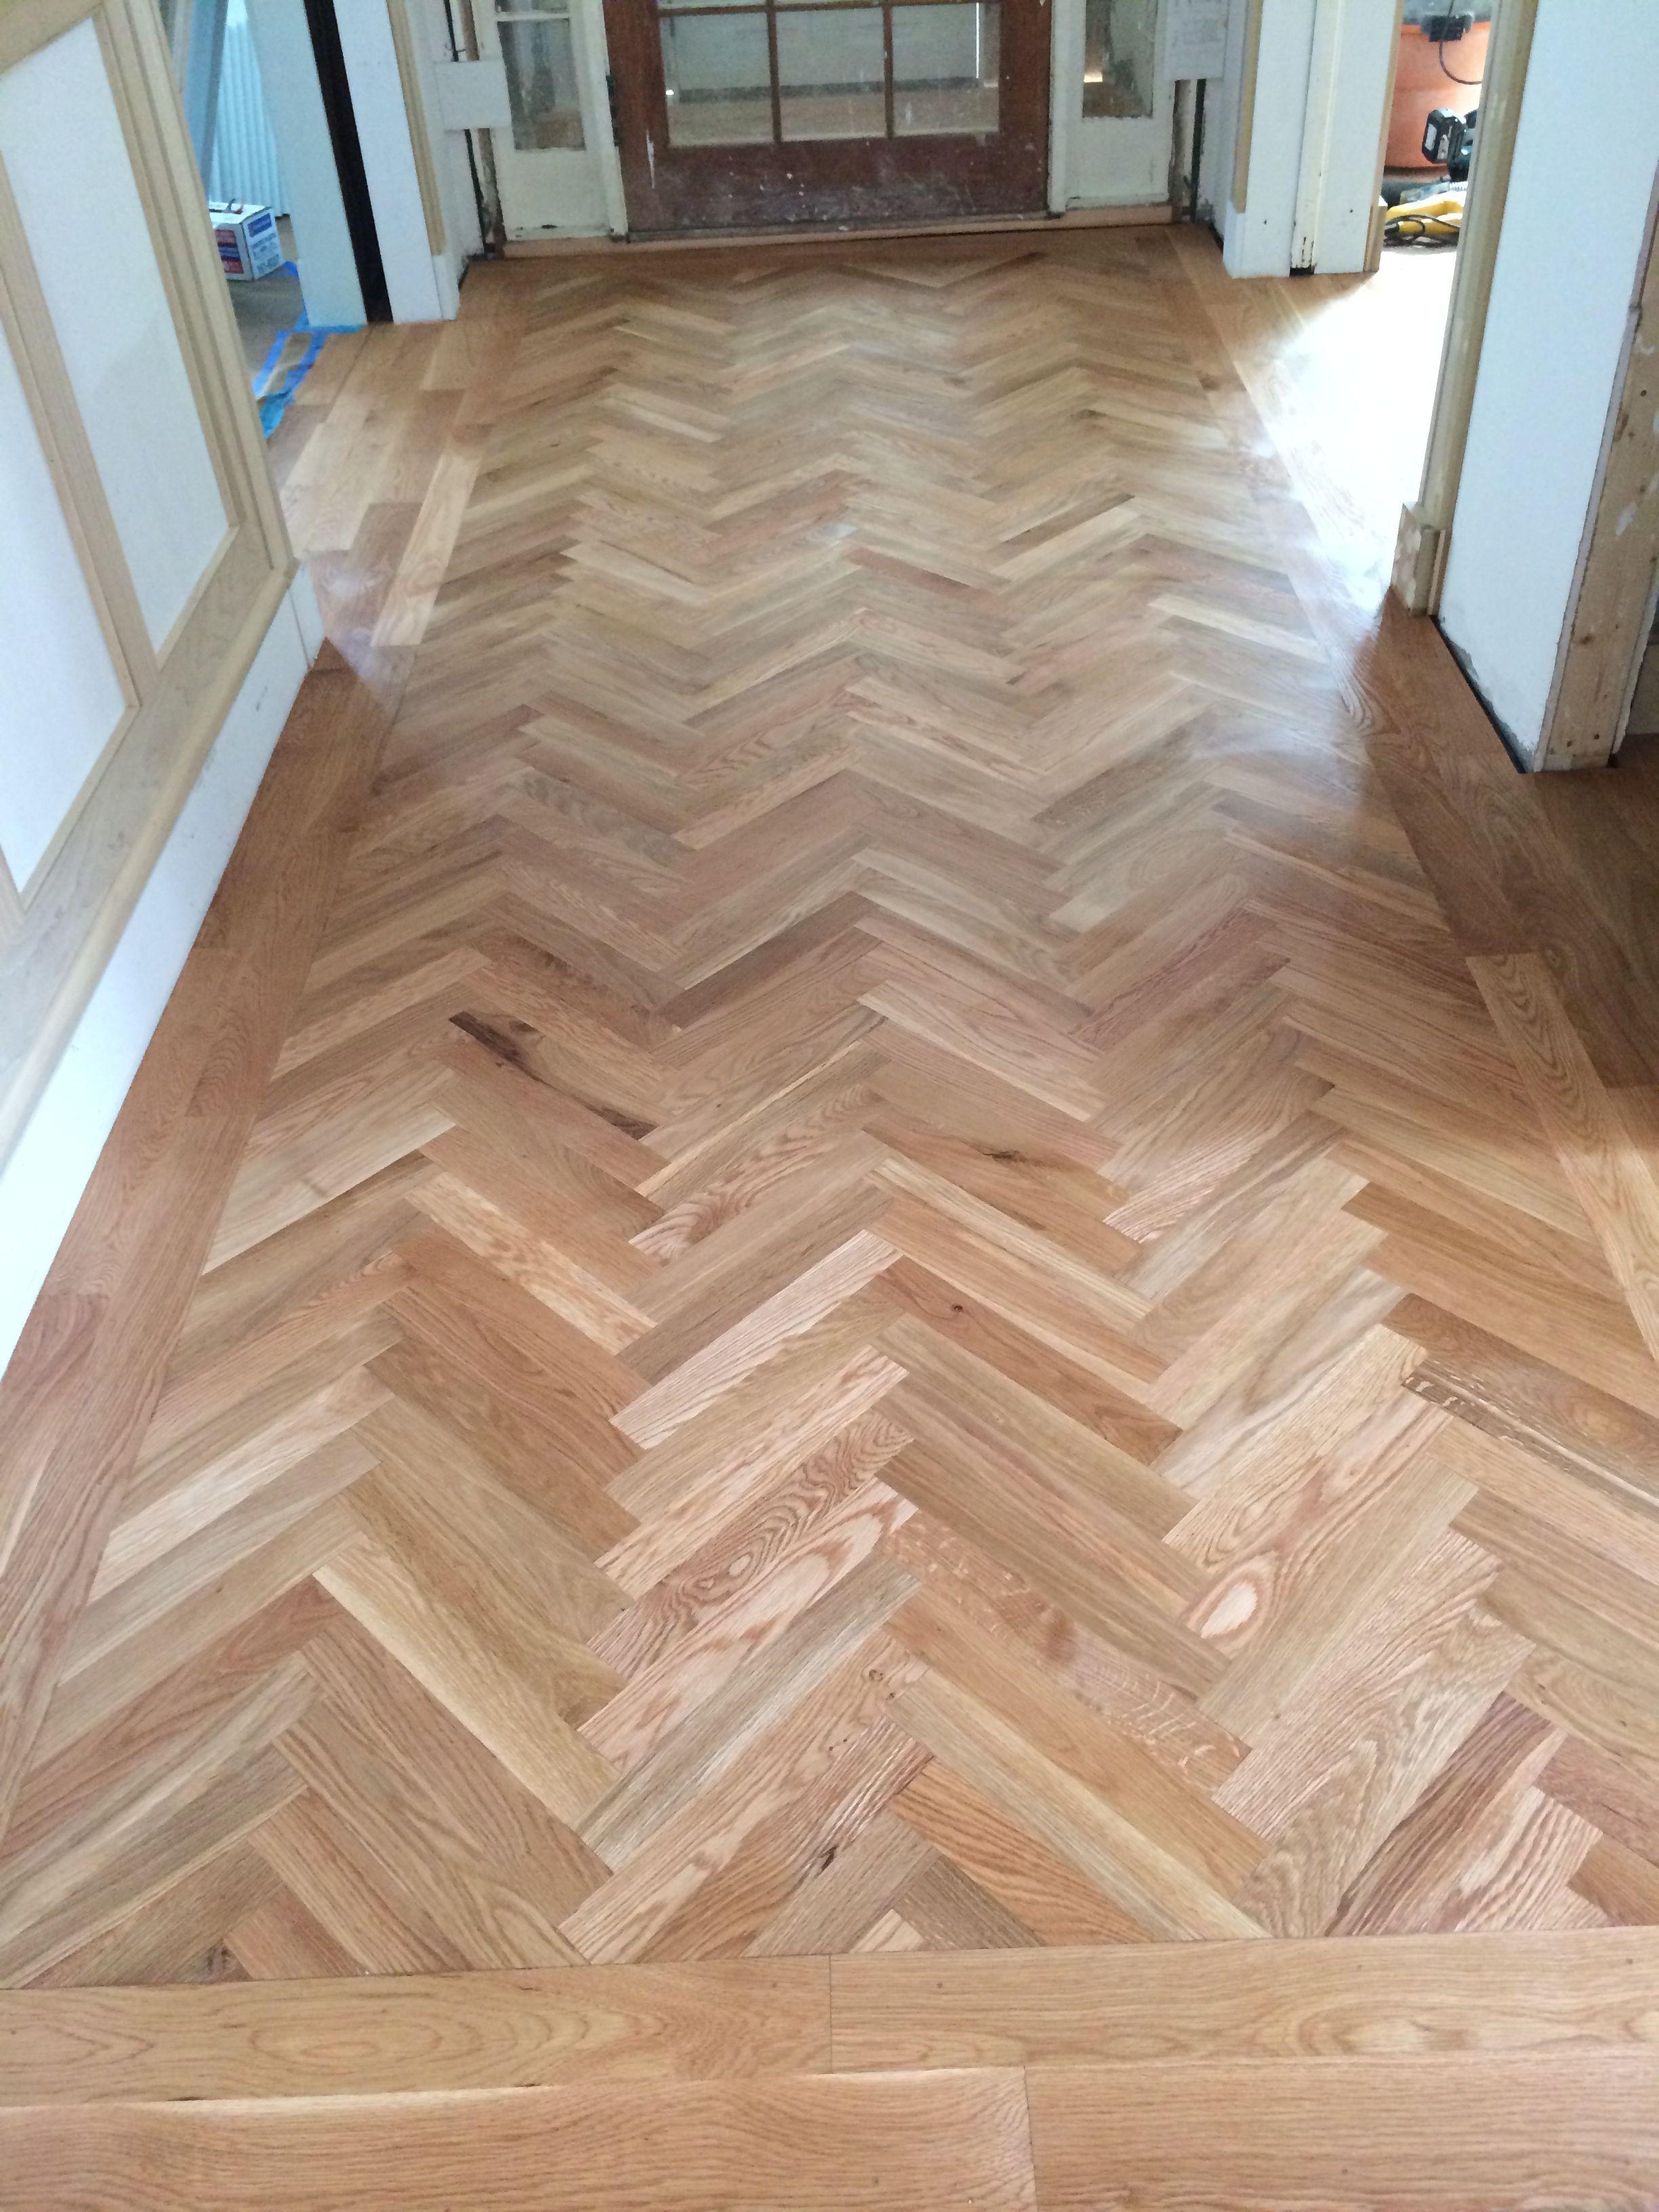 "2 1/4"" white oak hardwood flooring in a herring bone"